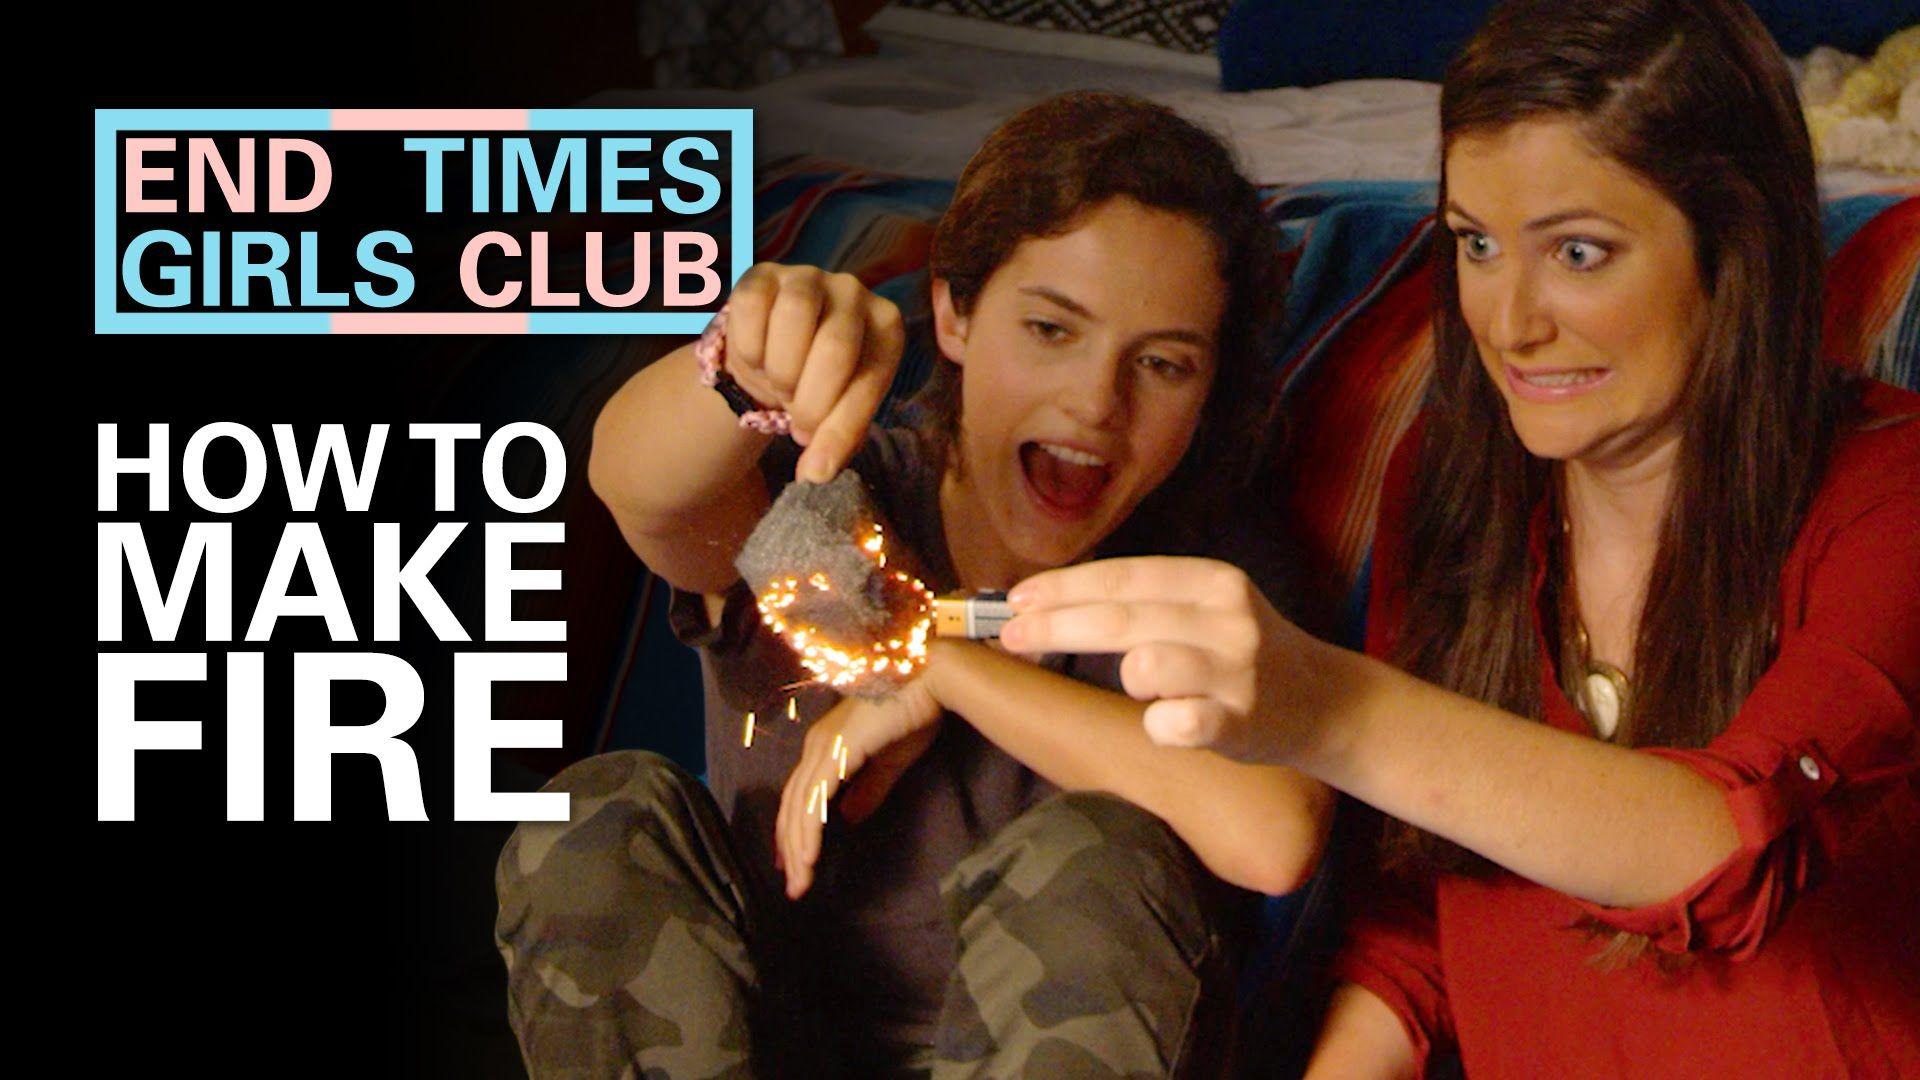 End Times Girls Club starring Rose Schlossberg